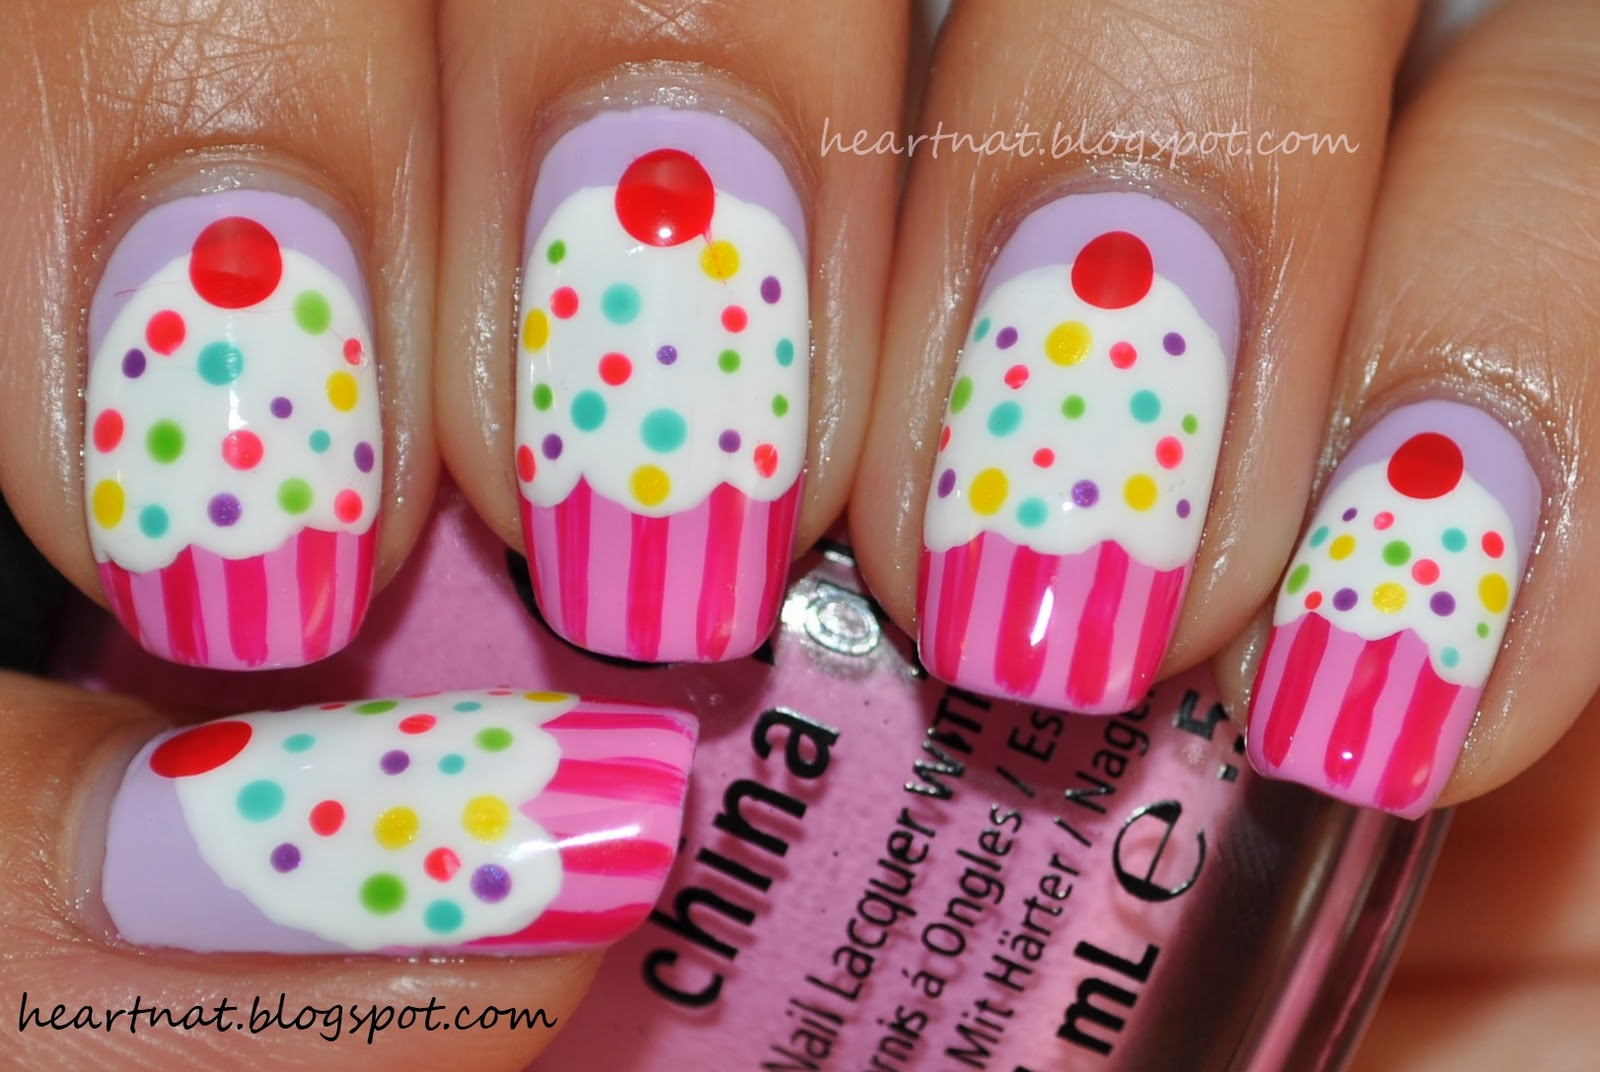 heartnat: China Glaze Electropop Cupcake Nails